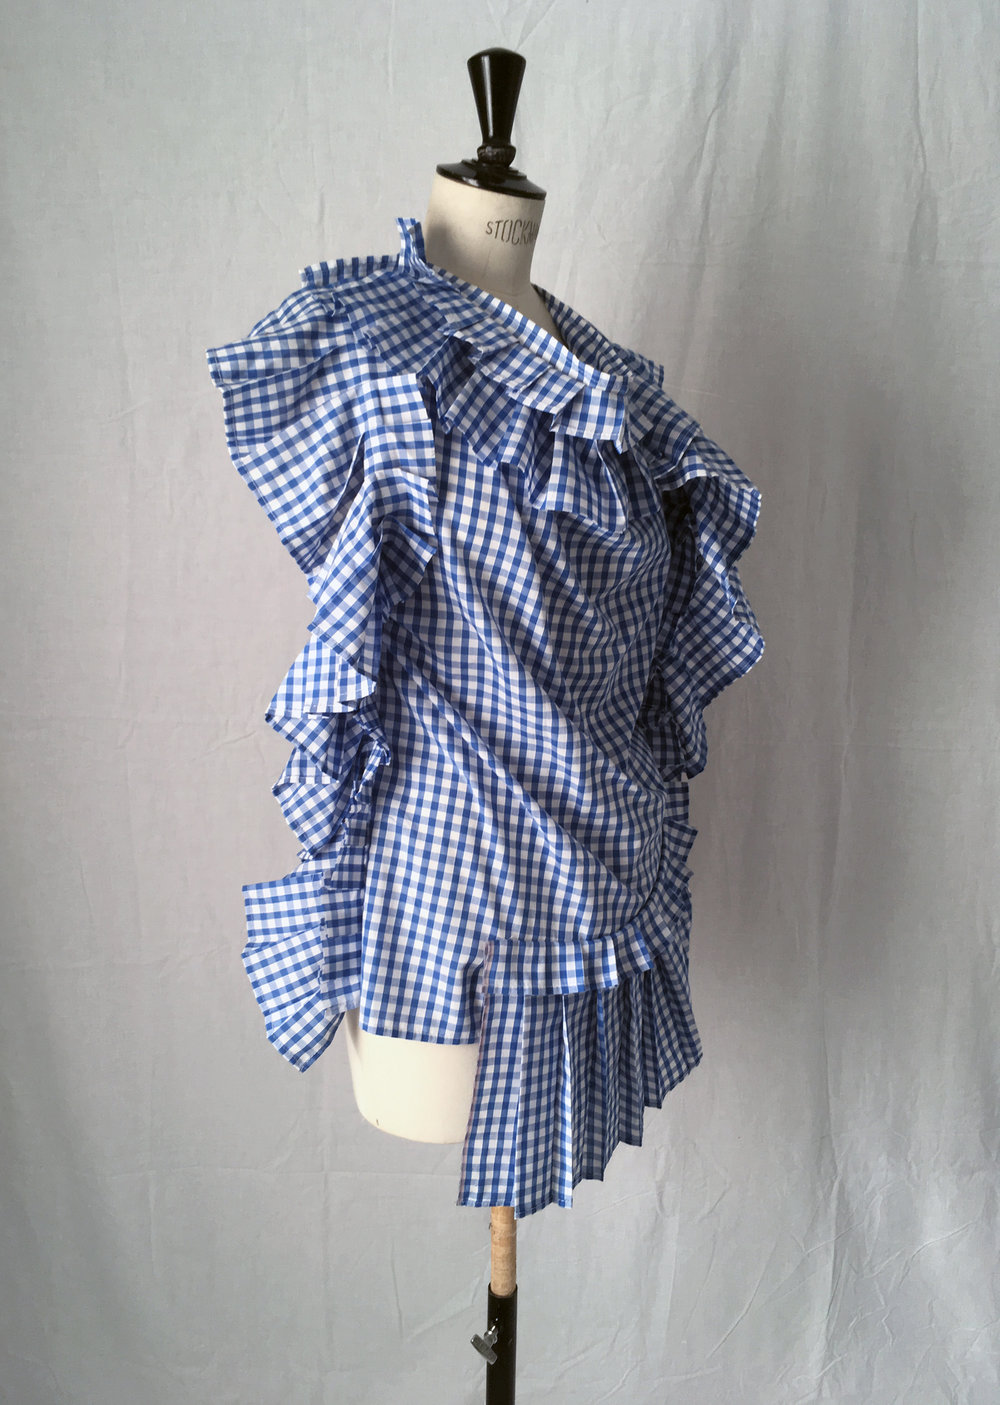 DRESS LTD BROKEN PILLOW Top & FLAT PACK PYJAMA Trousers #dressltd